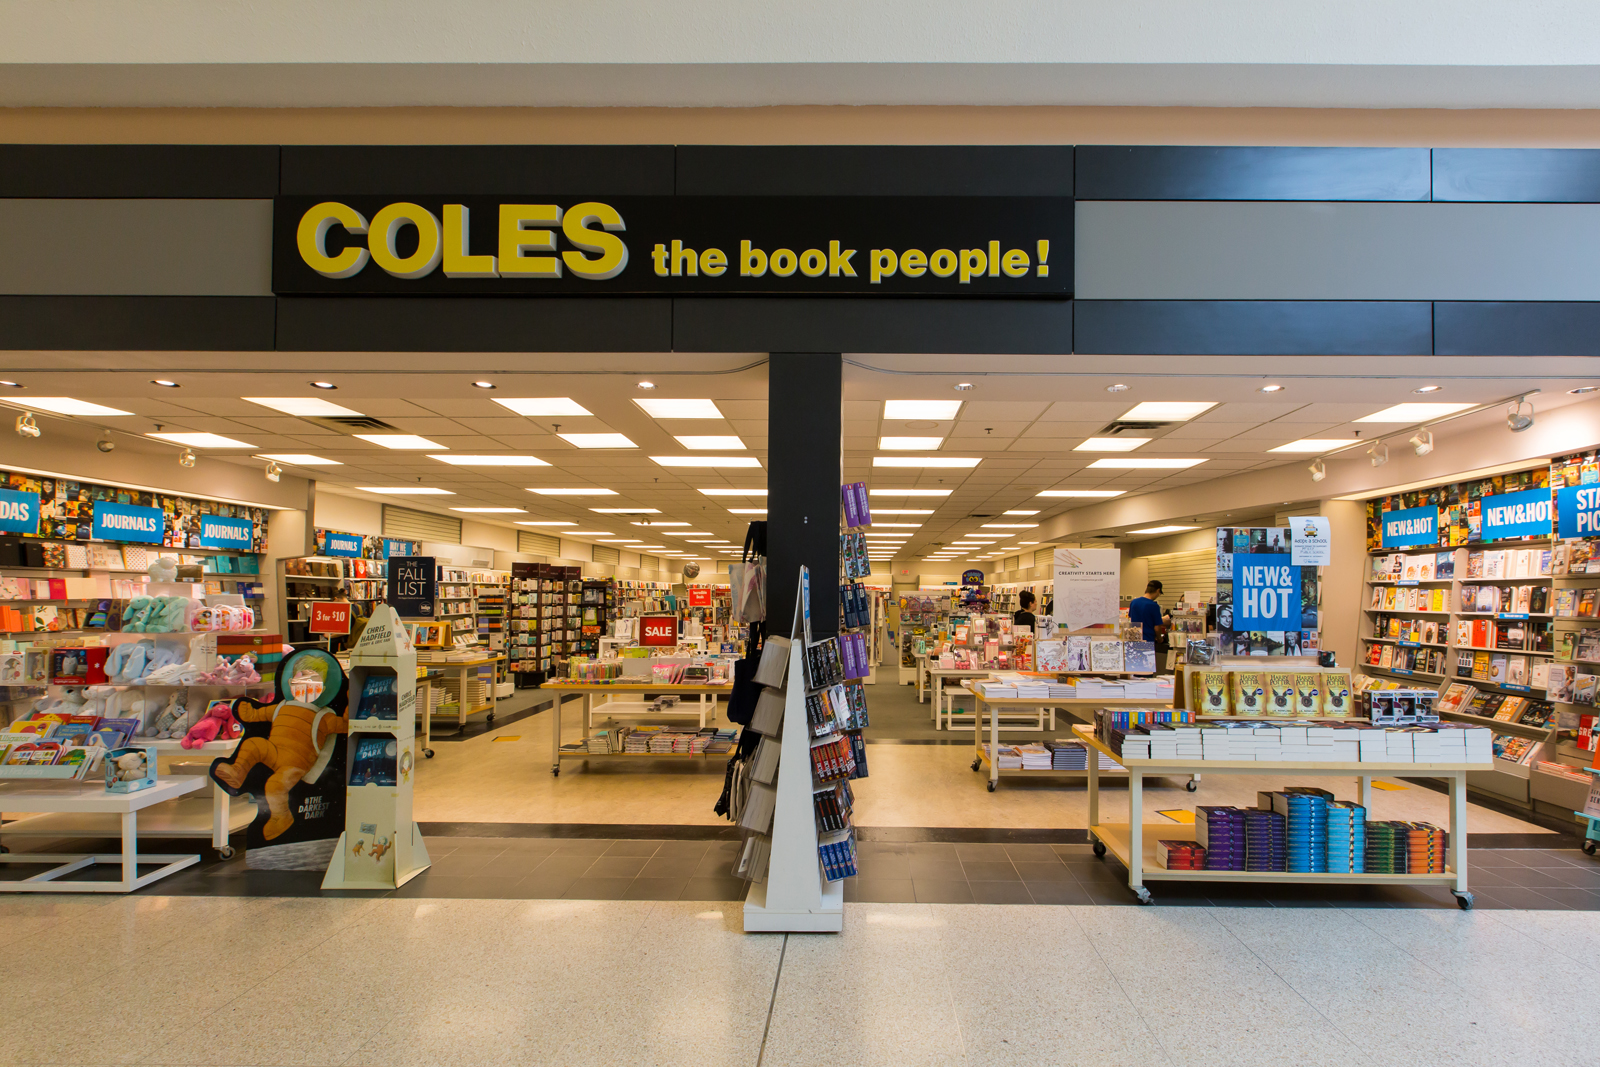 Coles Book Store